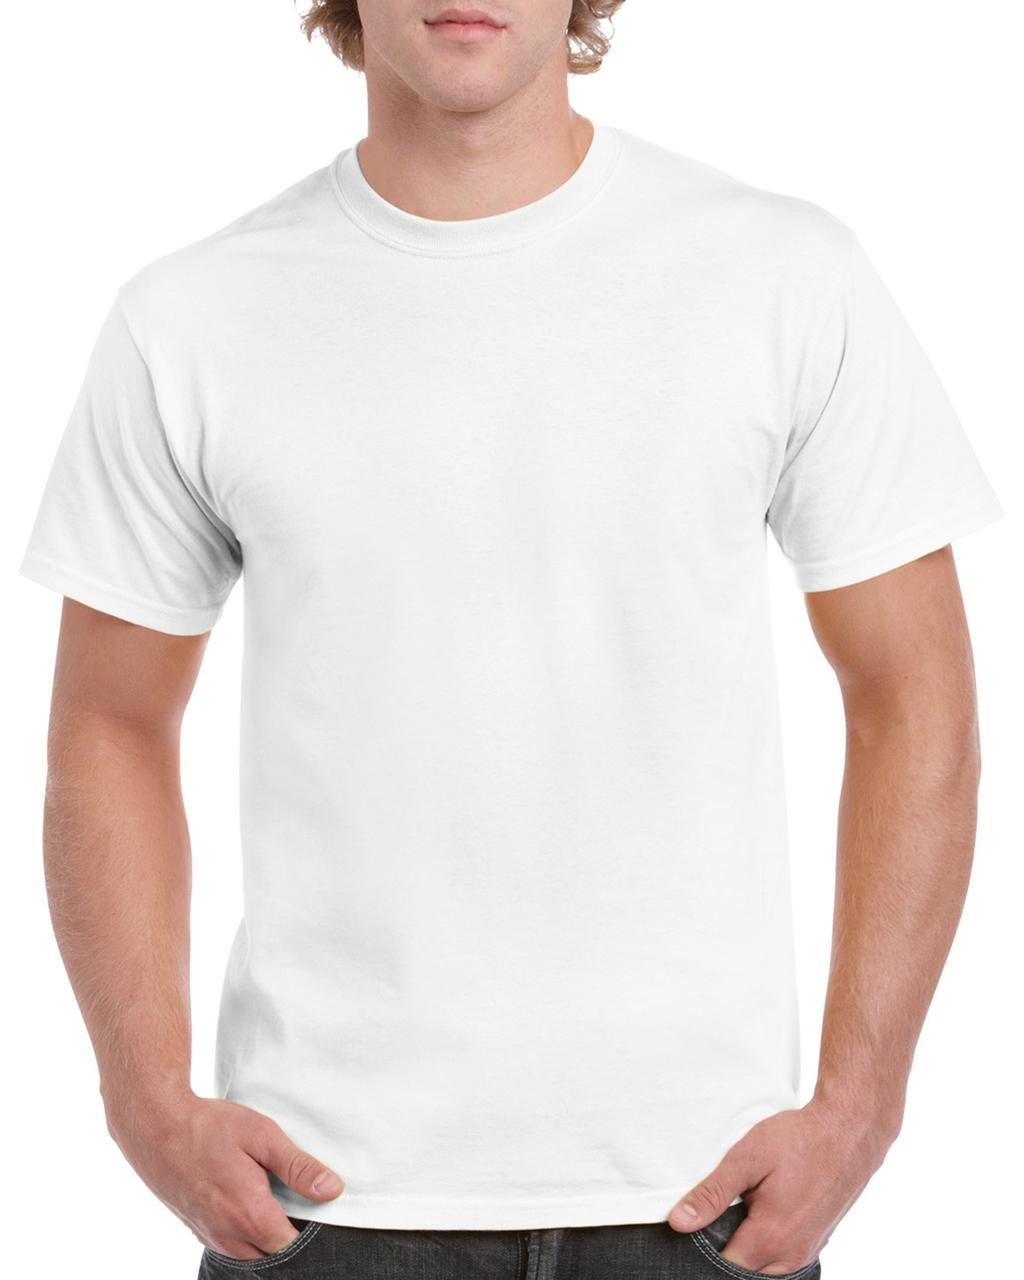 Gildan 5000 Heavy Cotton T-Shirt  a2b84c59fe3